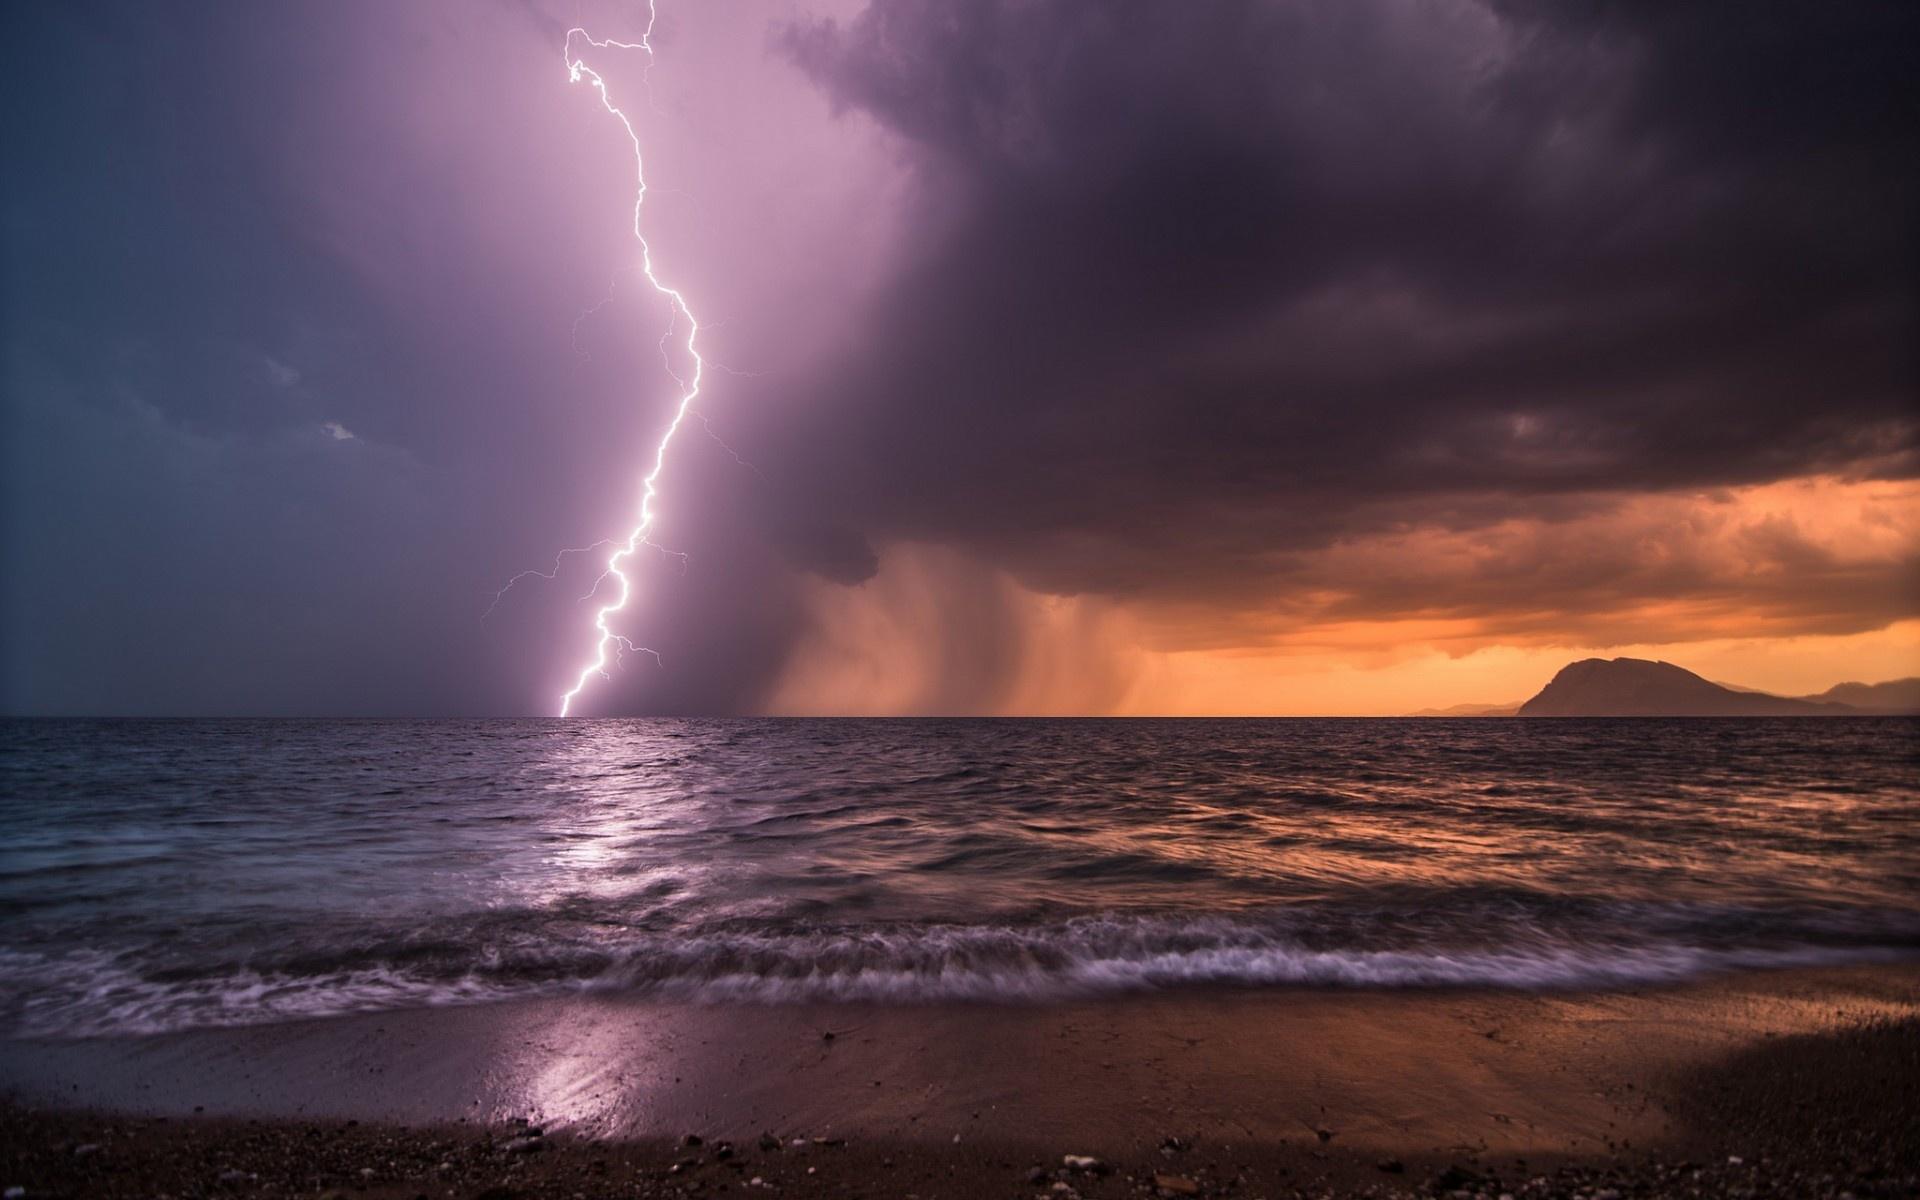 Wallpaper sea evening sky storm lightning shore beach desktop 1920x1200